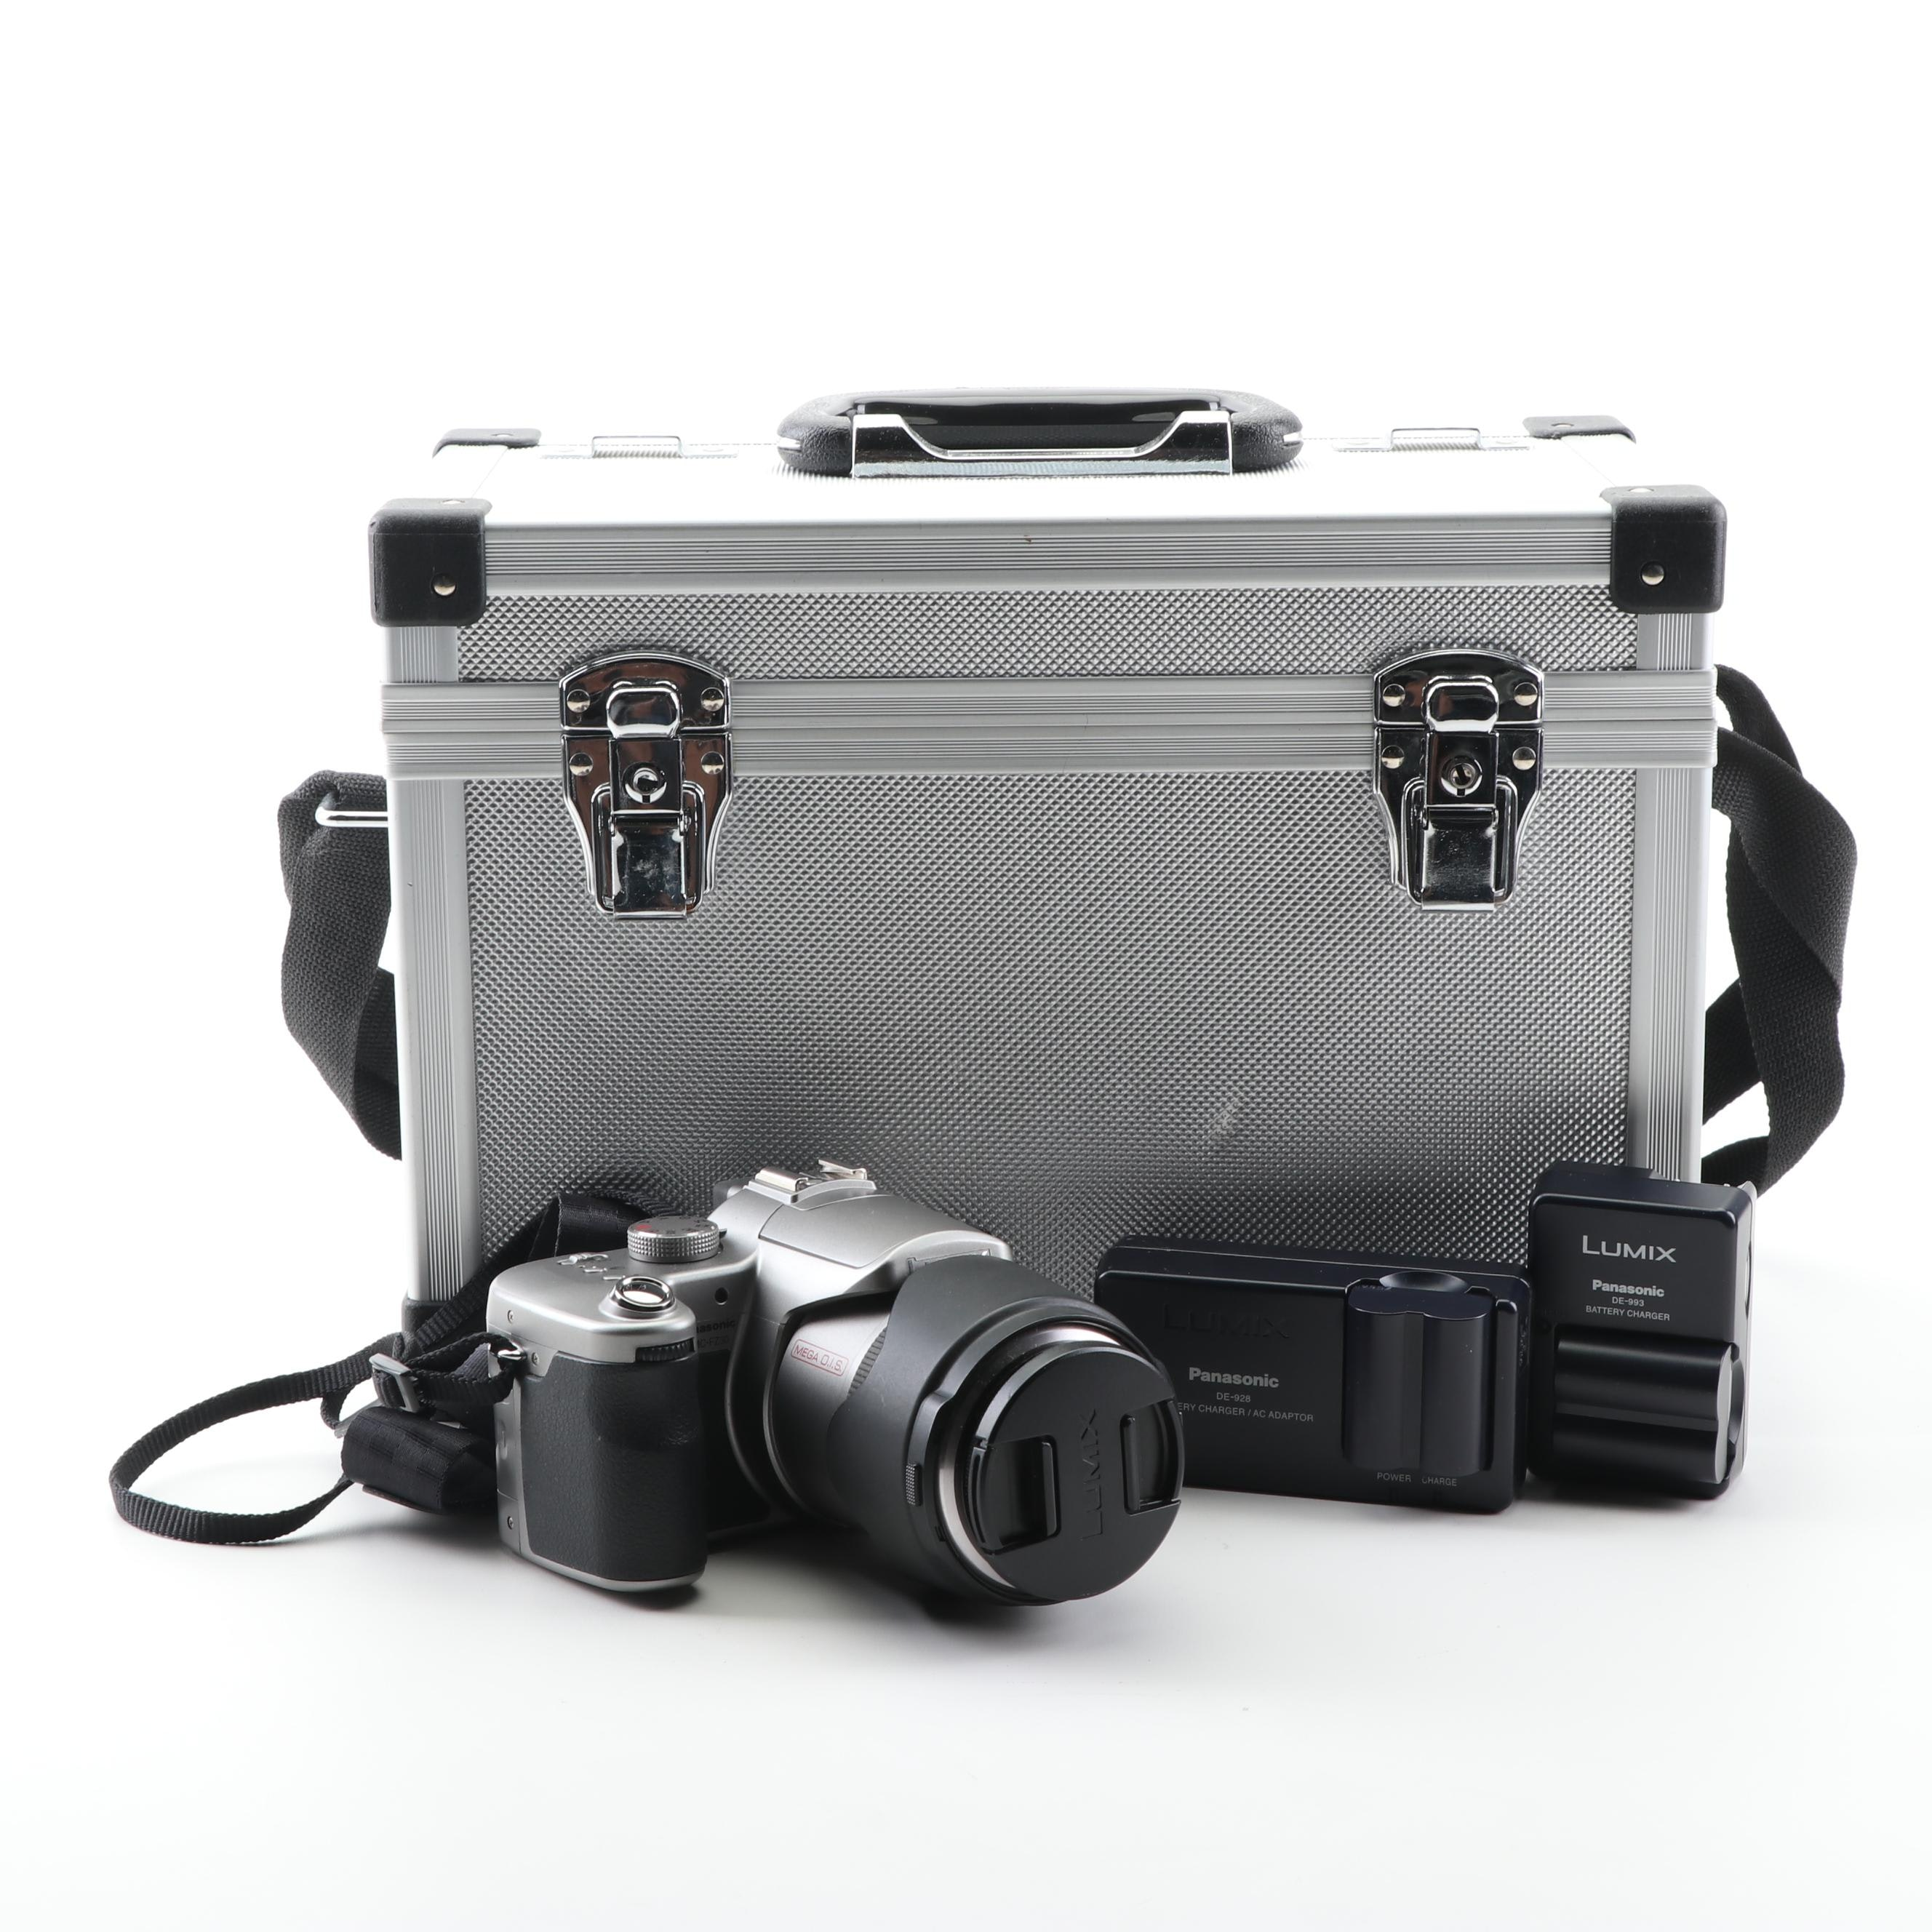 Panasonic DMC-FZ30 Lumix Digital Camera with Camera Case